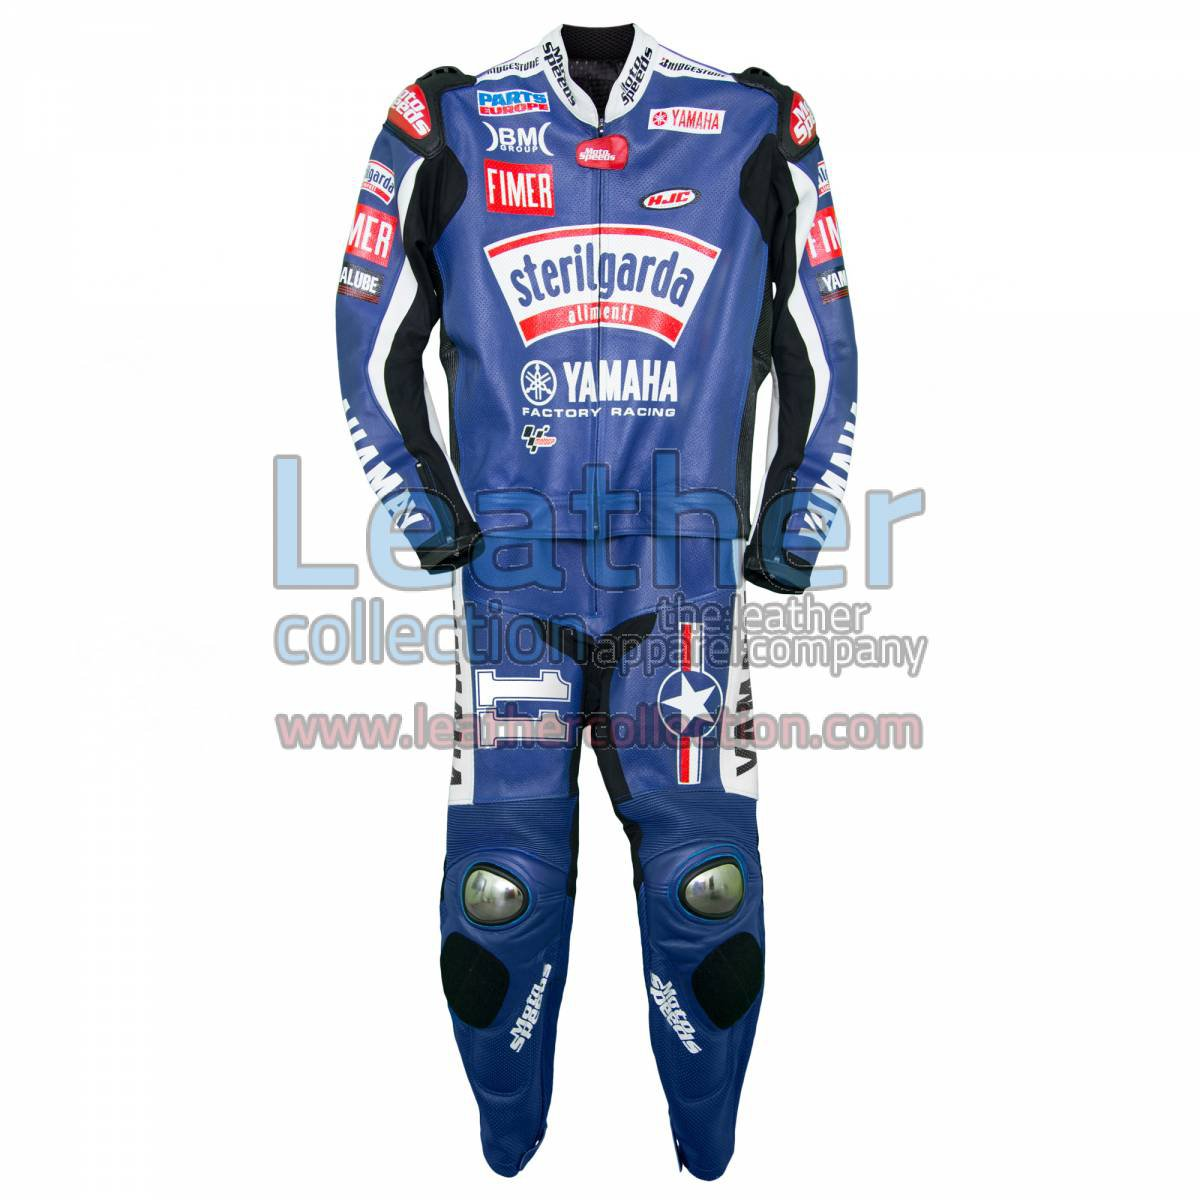 Ben Spies Sterilgarda Yamaha 2009 MotoGP Race Suit